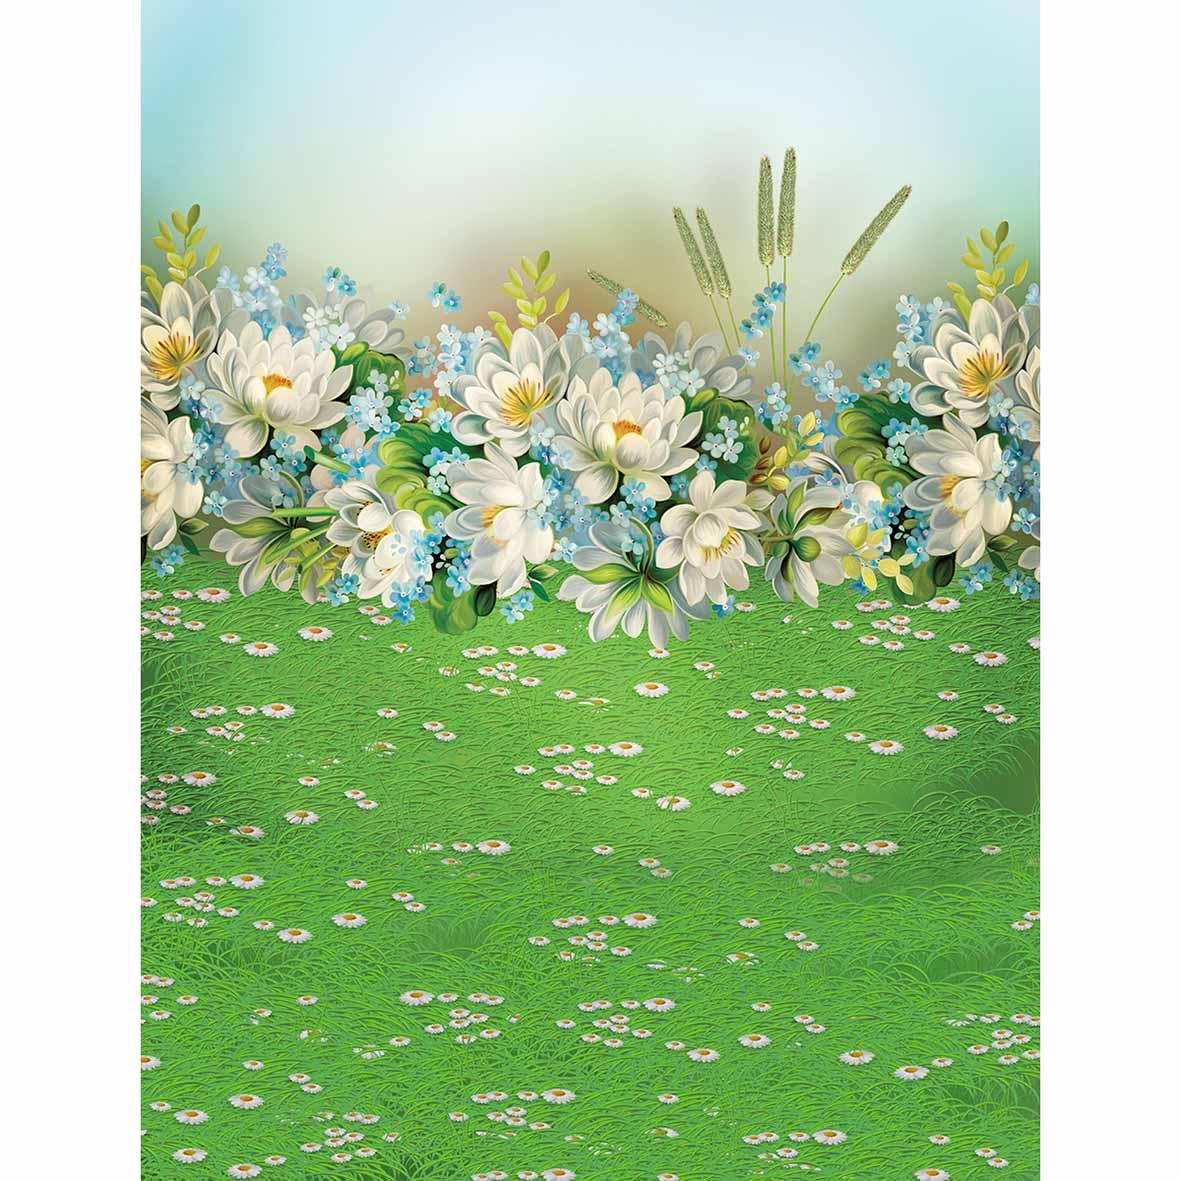 Allenjoy Photographic Background Grass White Flowers Cartoon Scenery